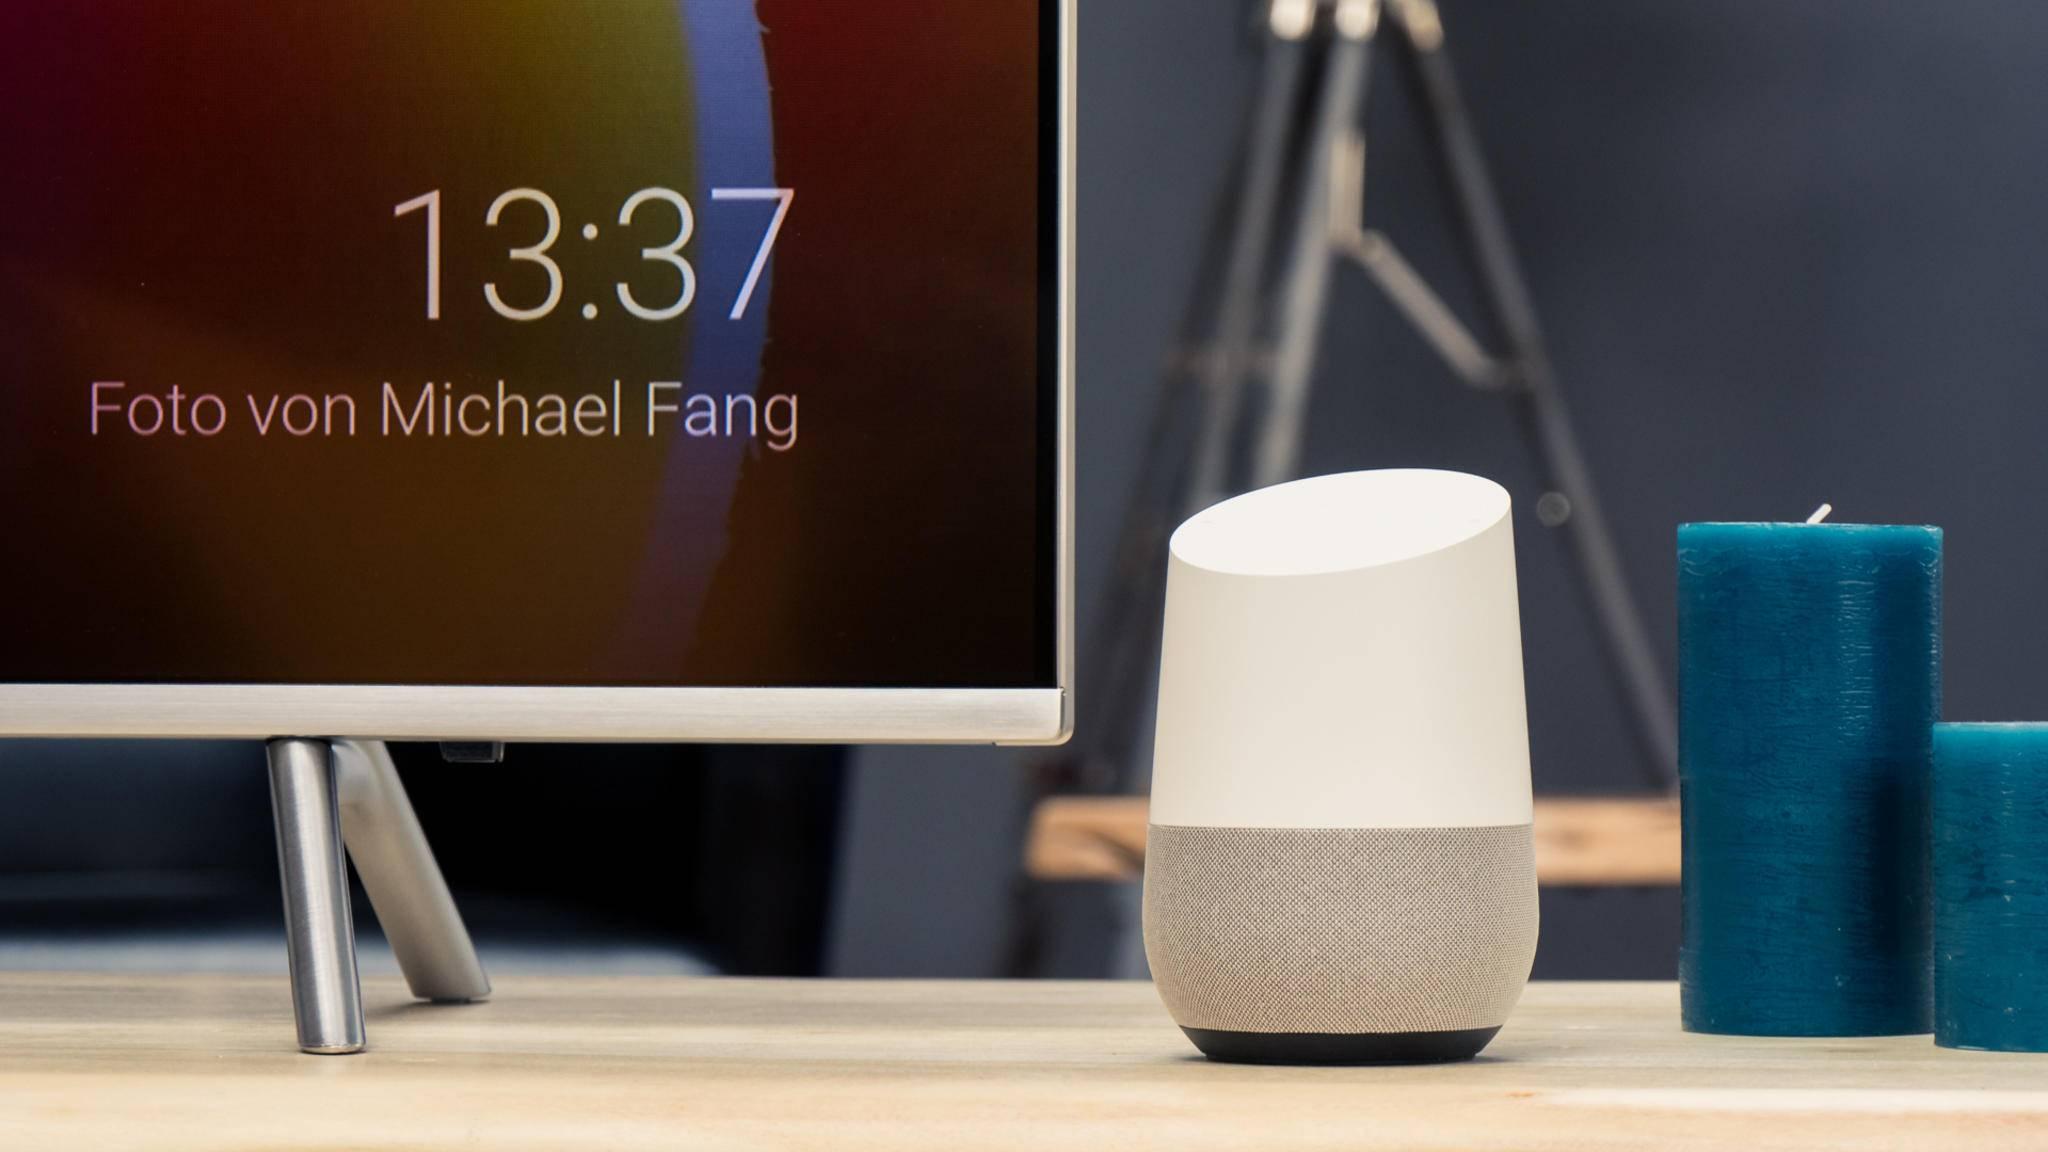 Per Chromecast kann Google Home auch Apps wie YouTube oder Netflix auf dem TV starten.